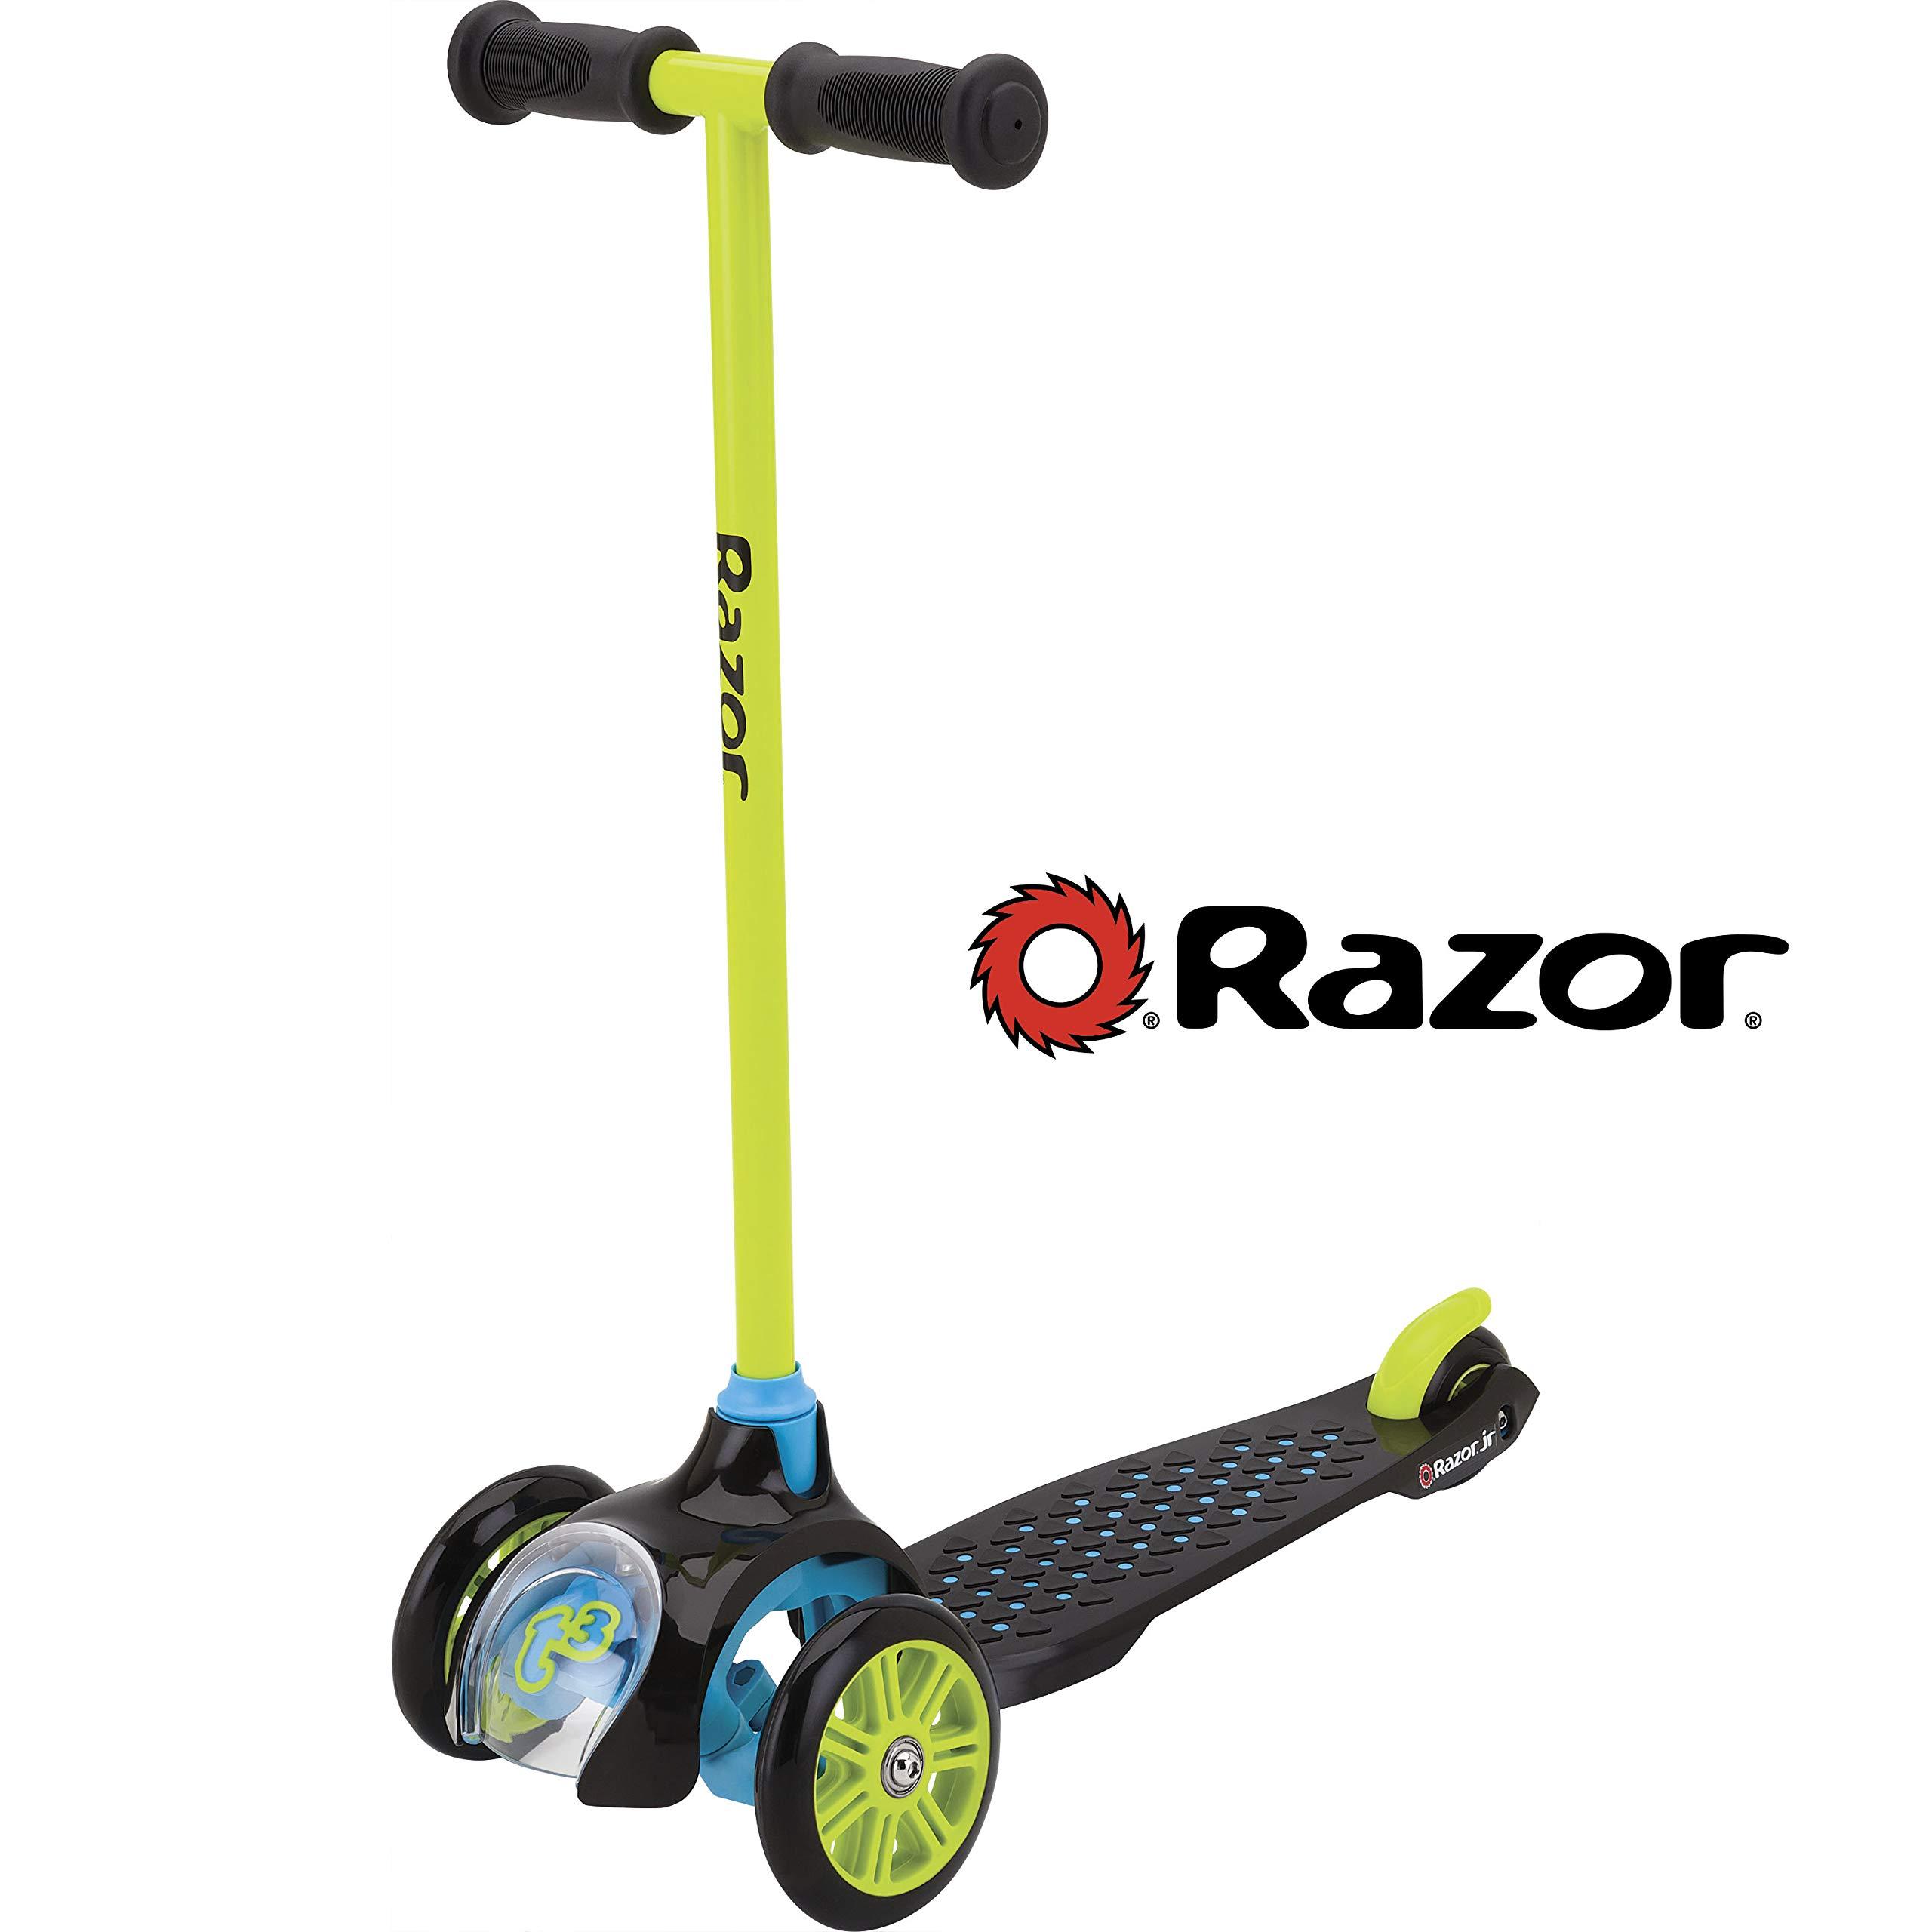 Razor Jr. T3 Kick Scooter - Green by Razor